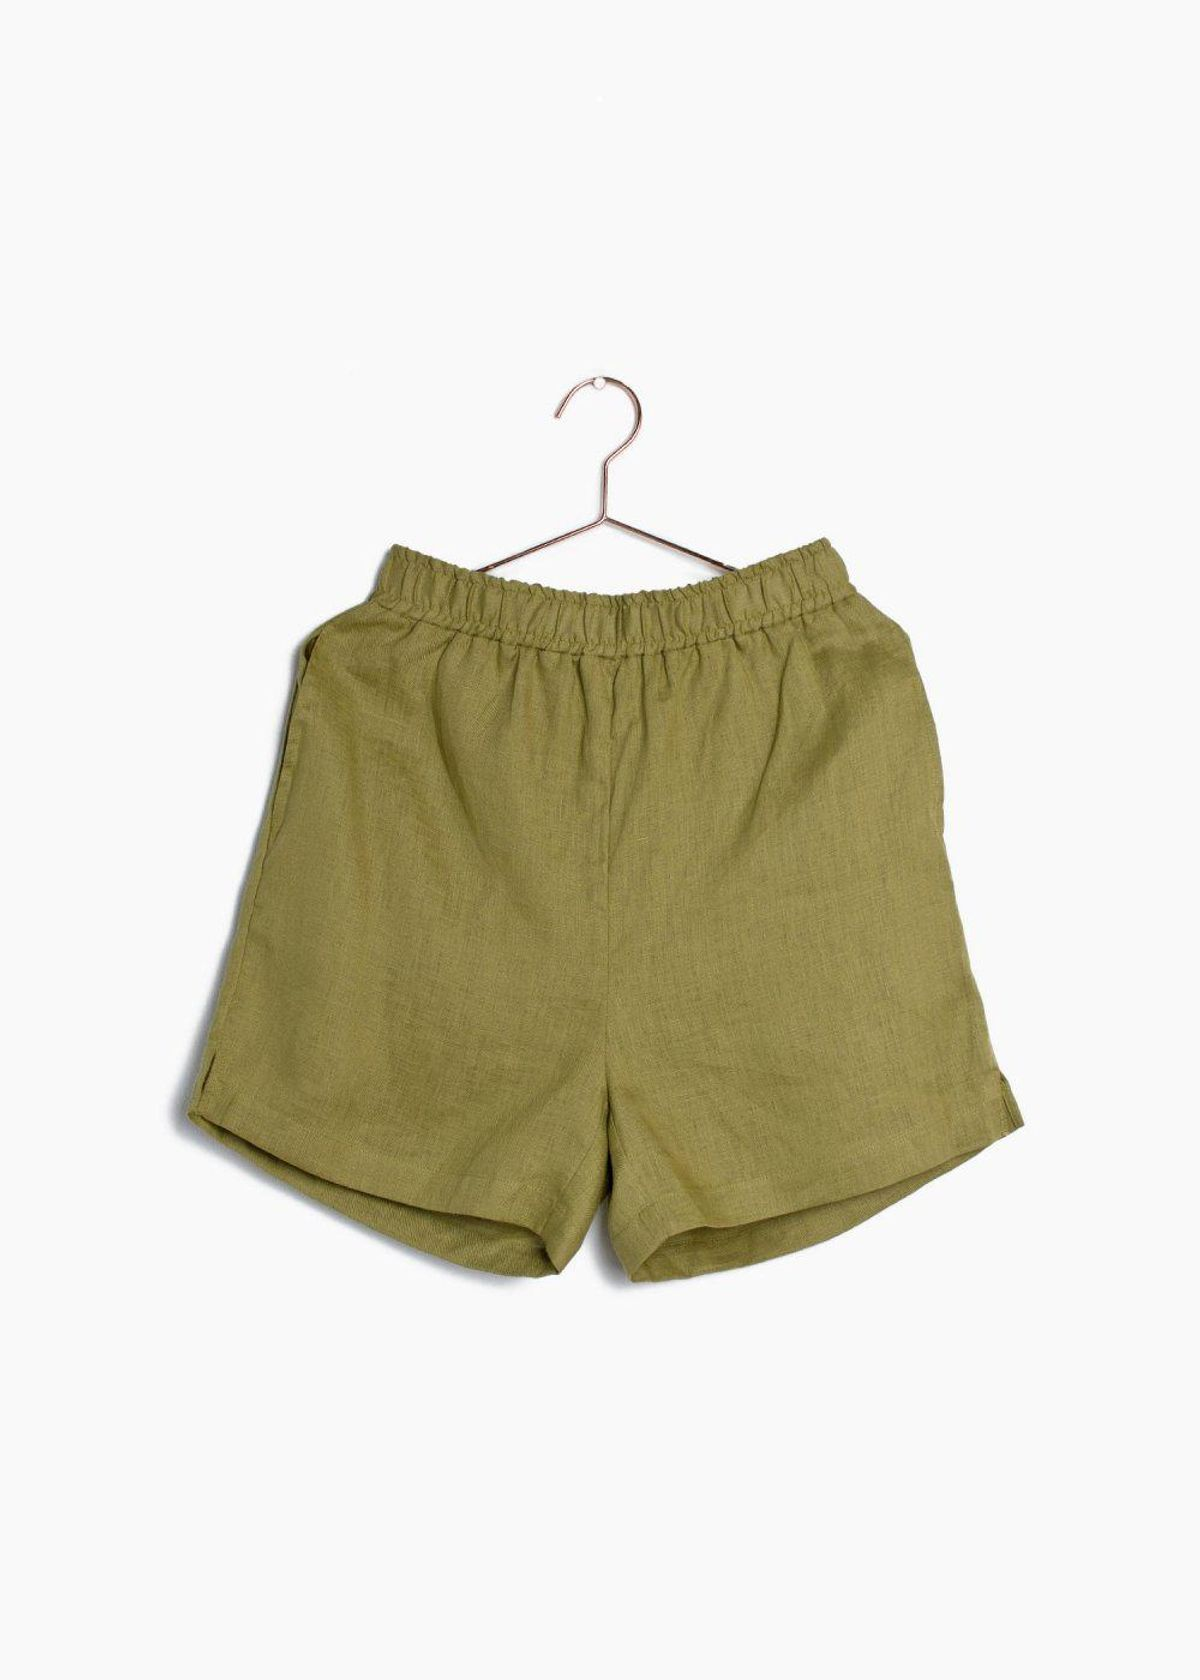 mod ref the nannda shorts